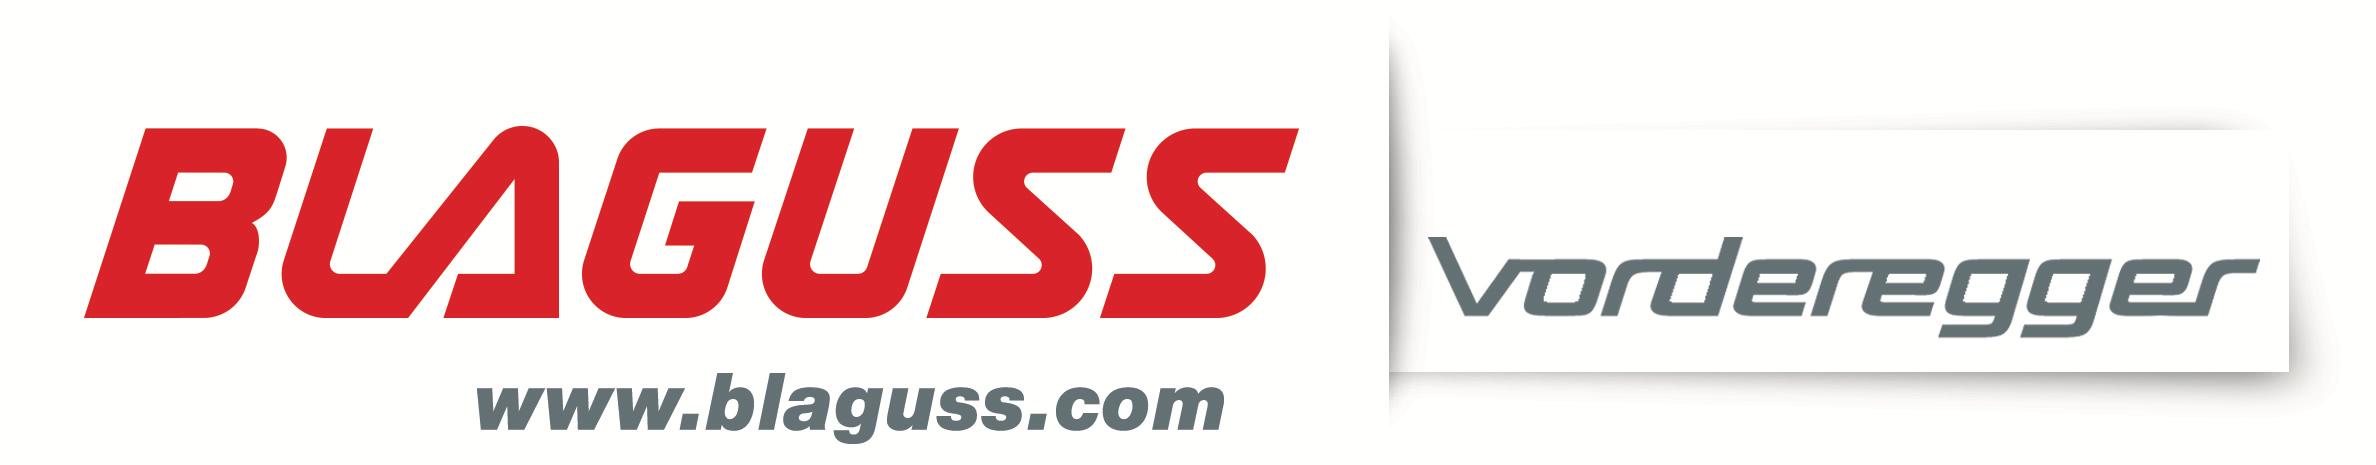 Logo Blaguss Vorderegger